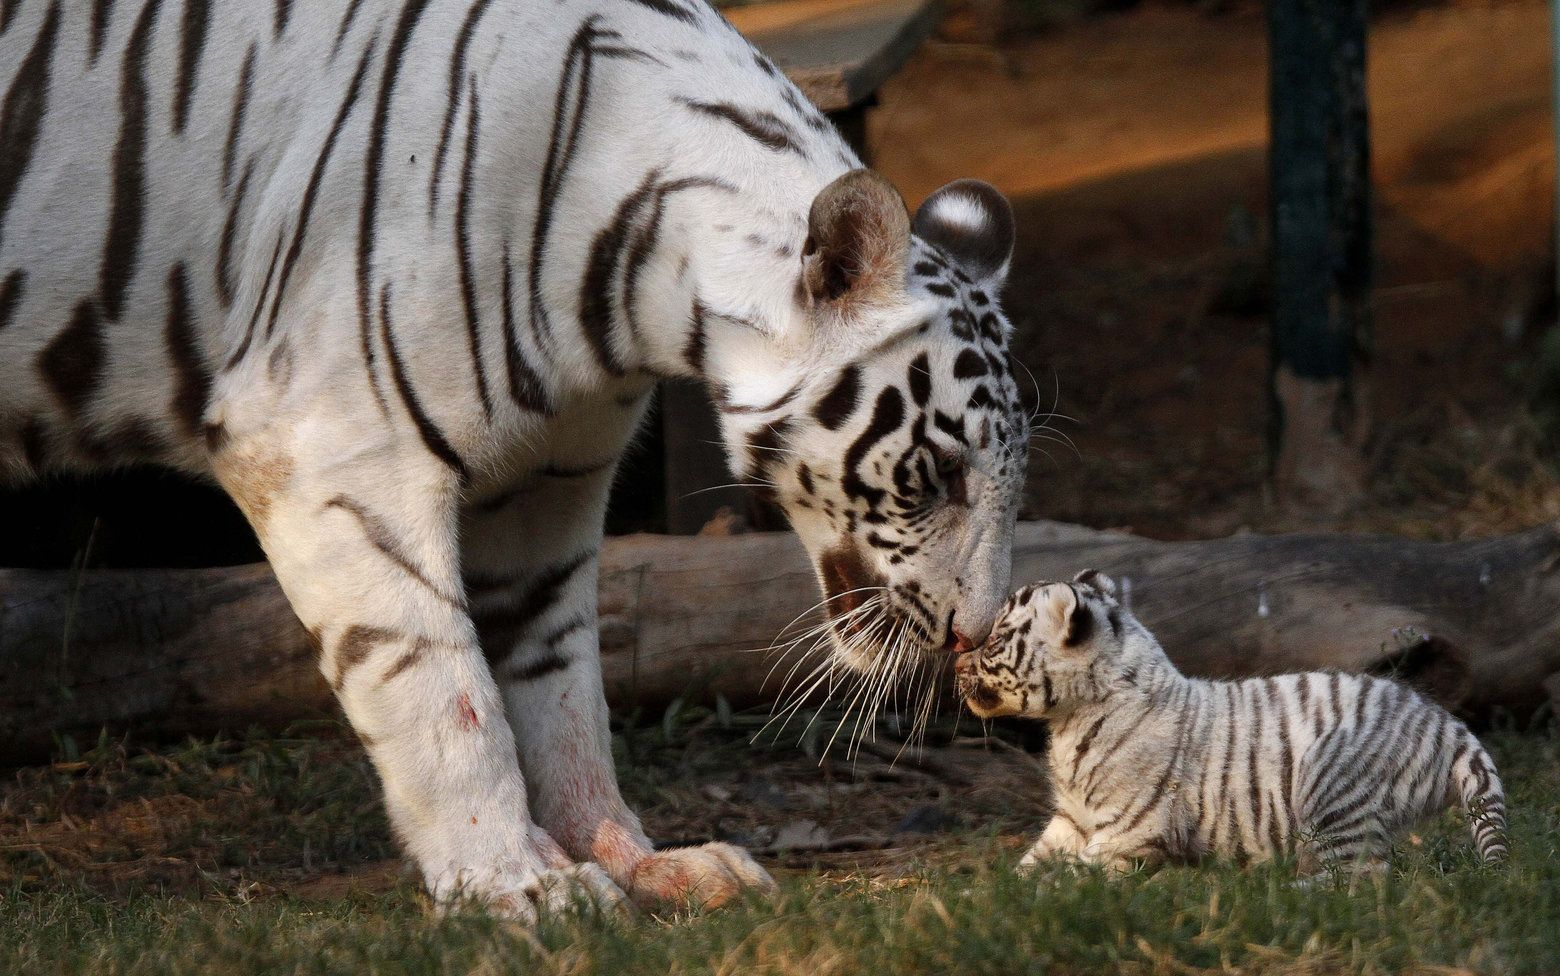 Tiger countries agree to preserve bigcat habitats Big